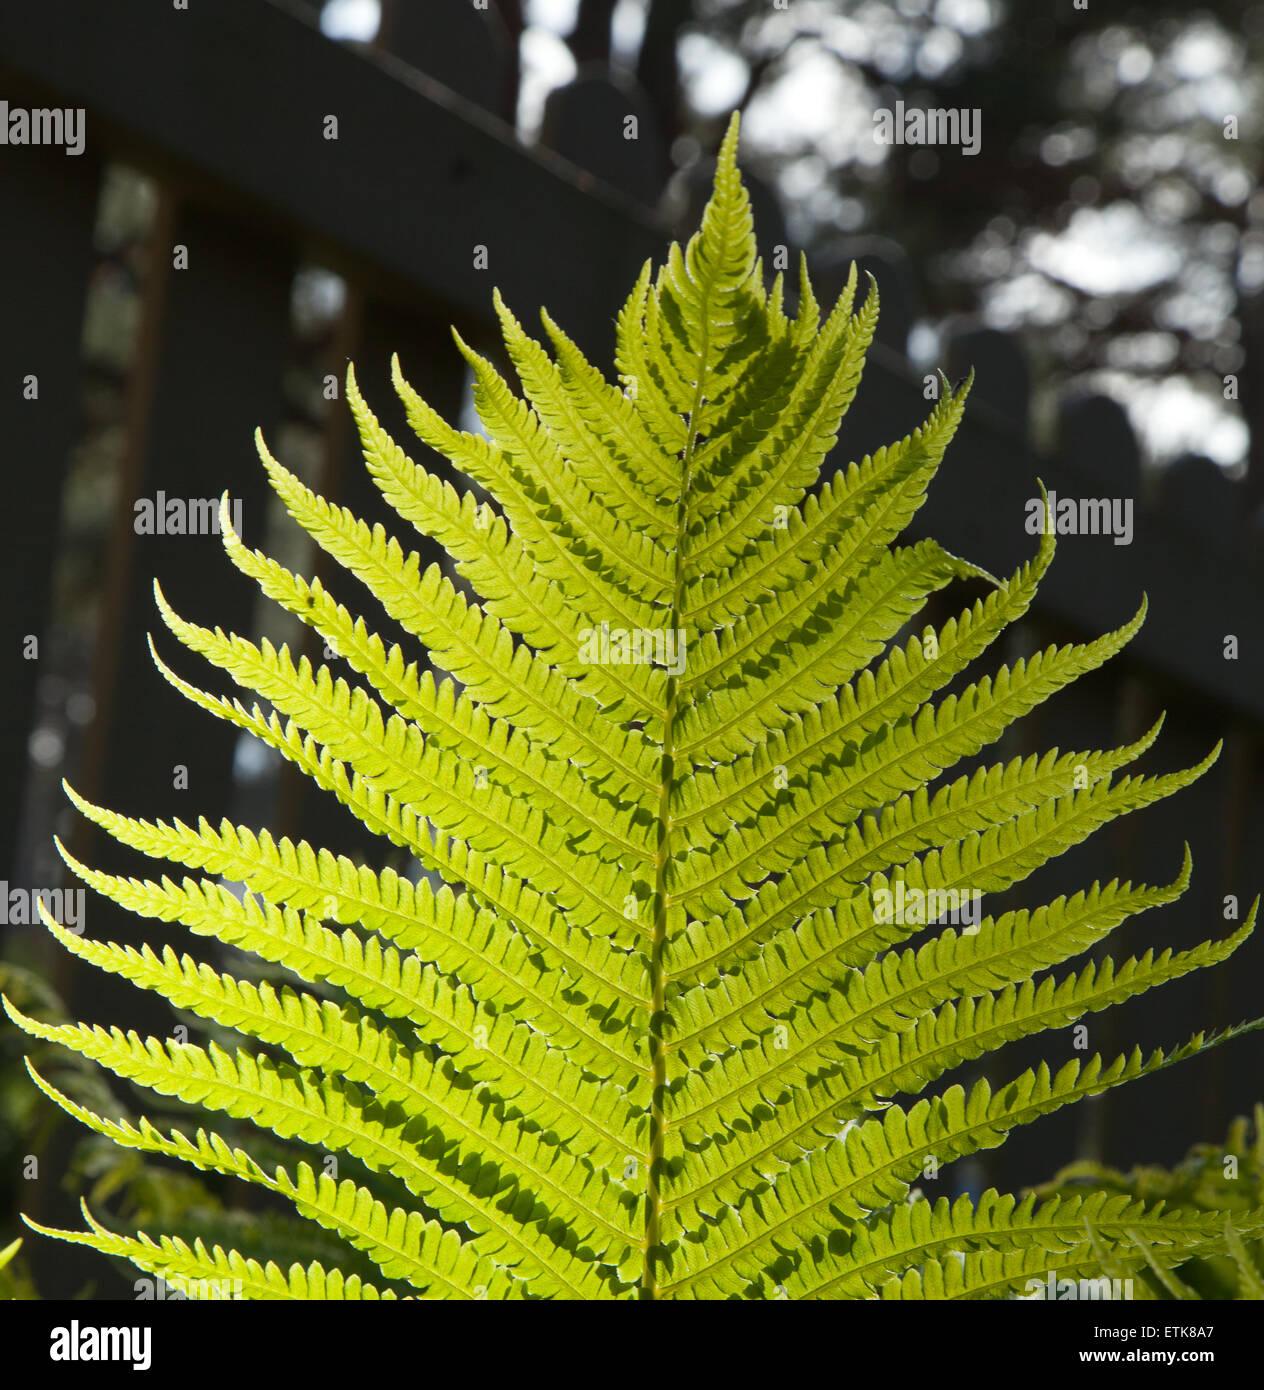 Leaf of fern - Stock Image